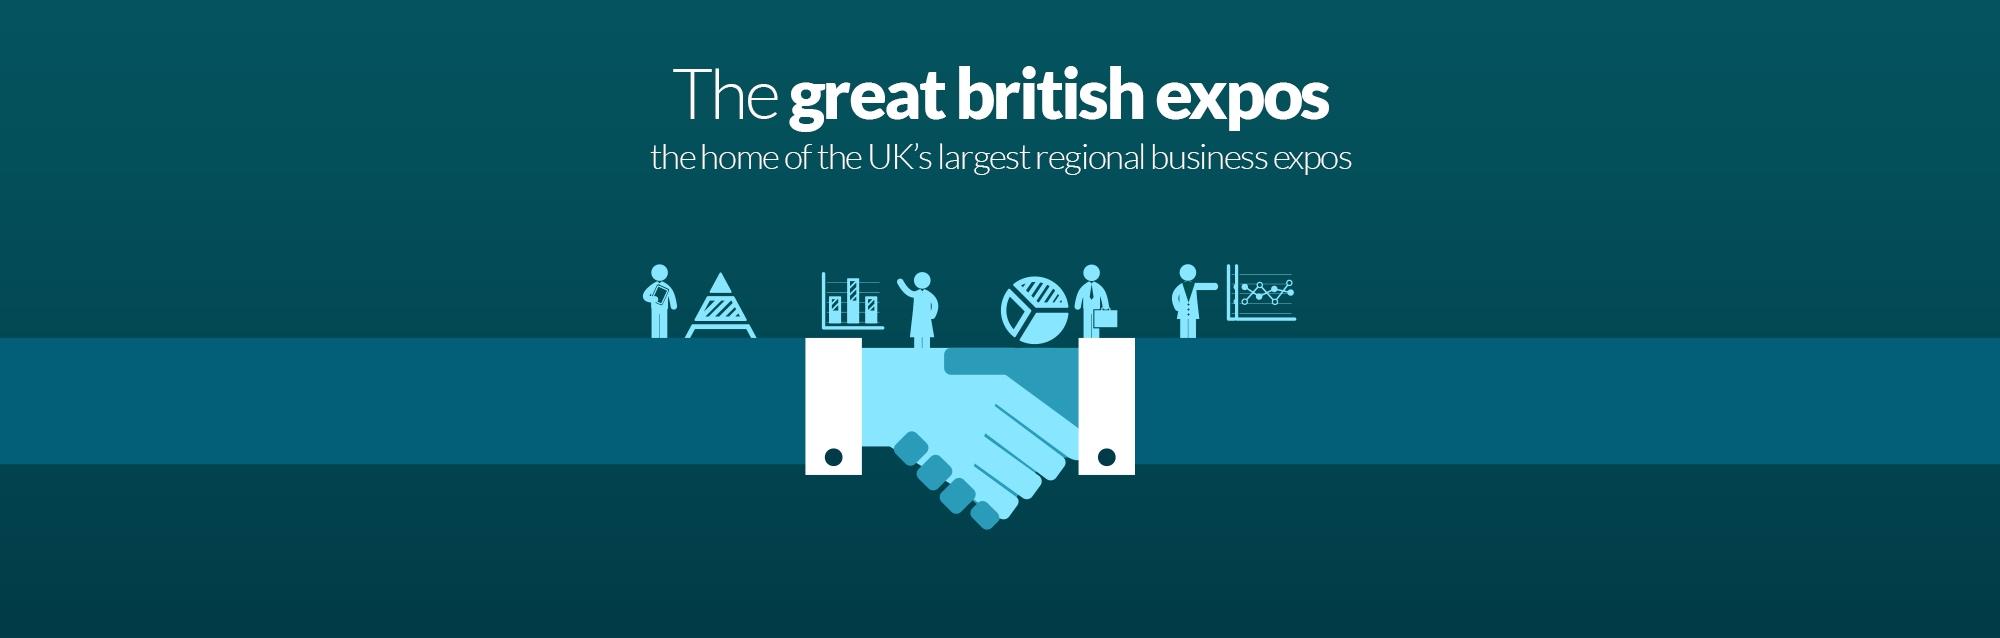 Great British Expos